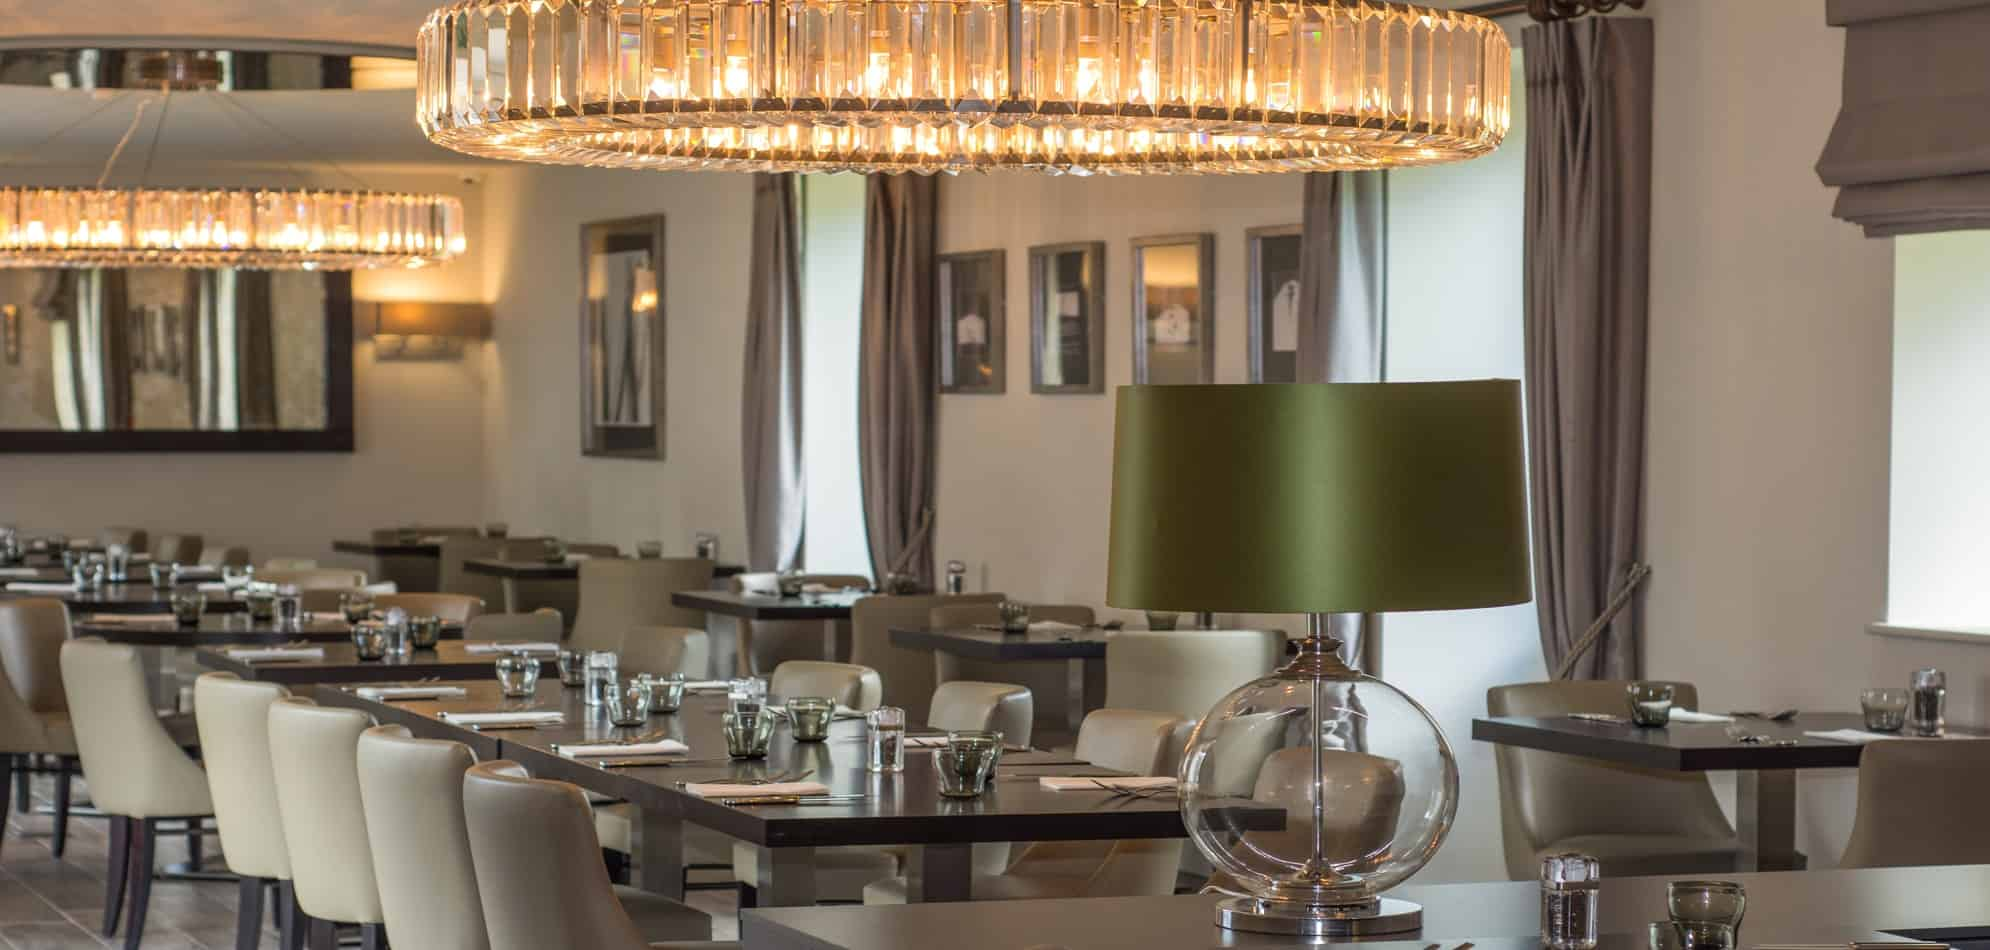 Monadh Dining